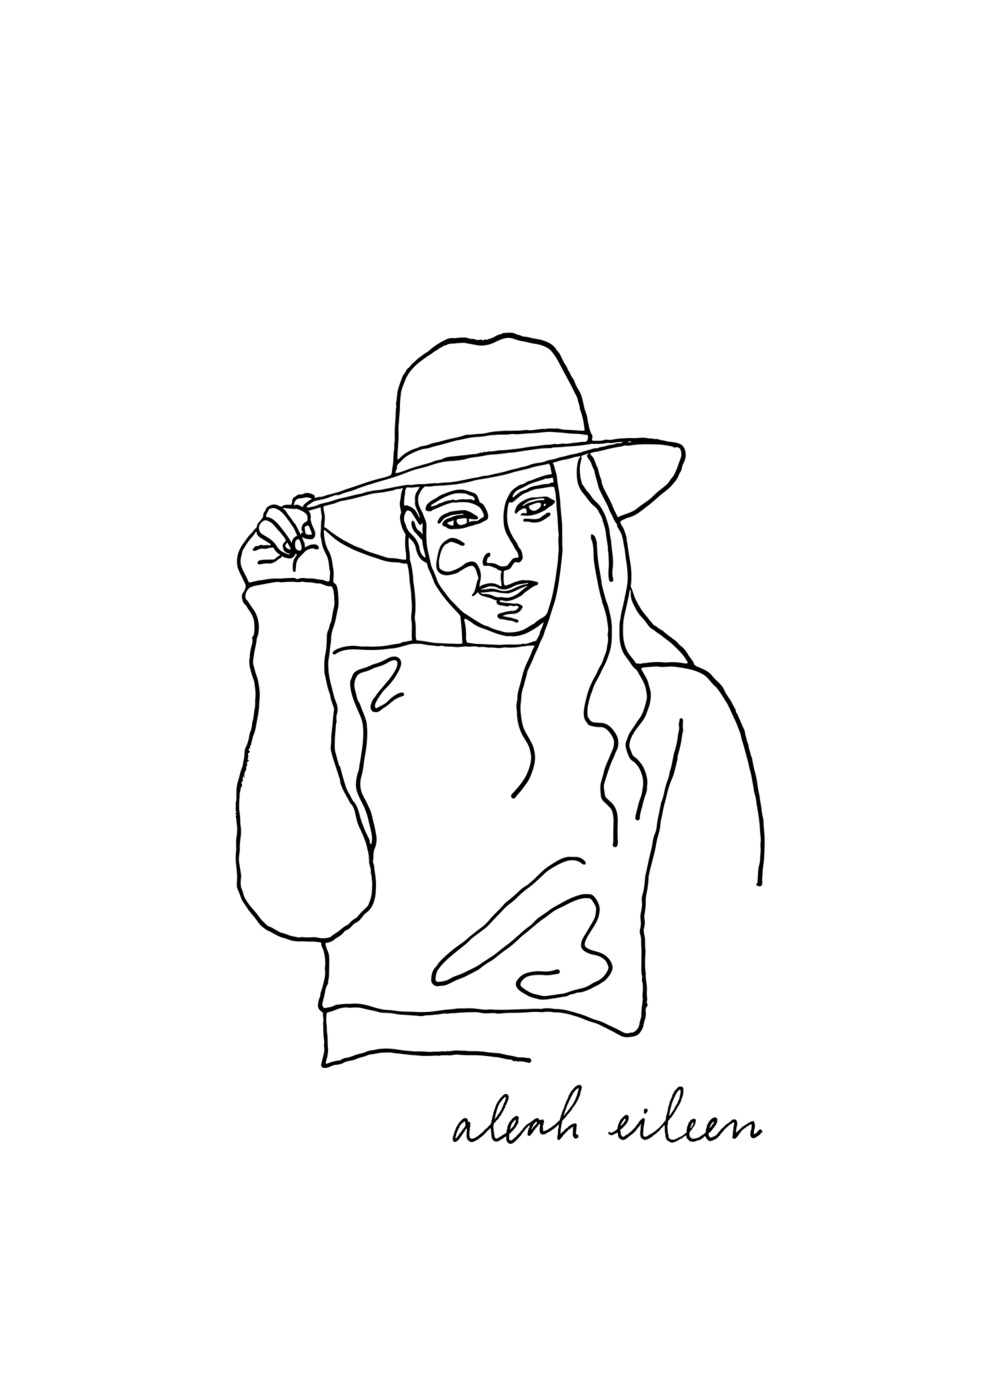 transparent 2.png